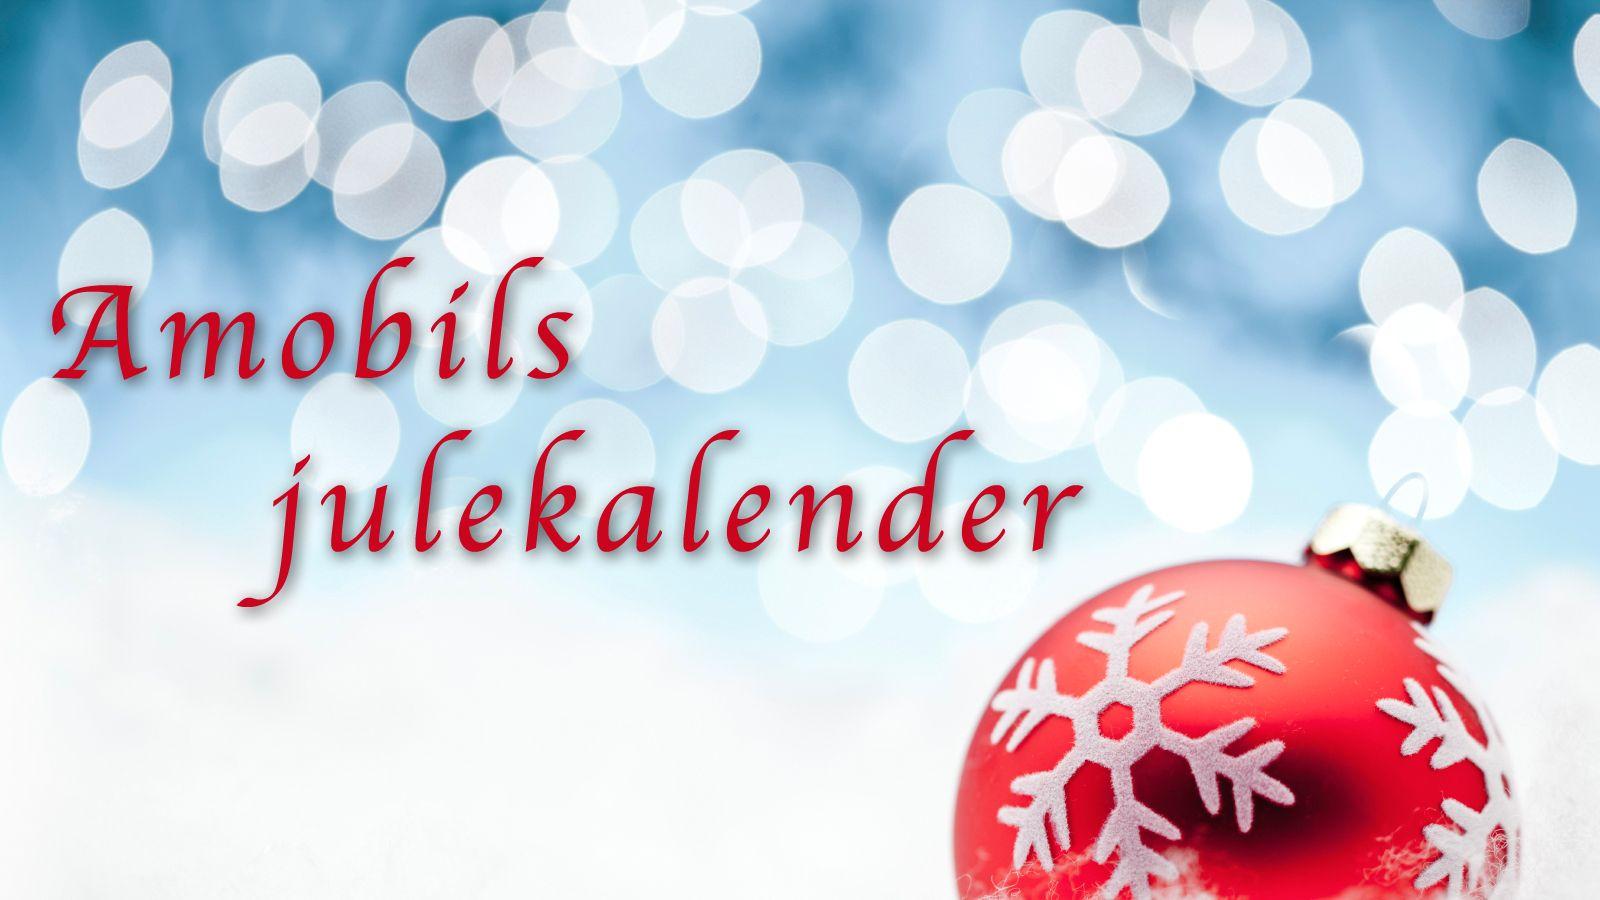 Julekalender 2012 - luke 15